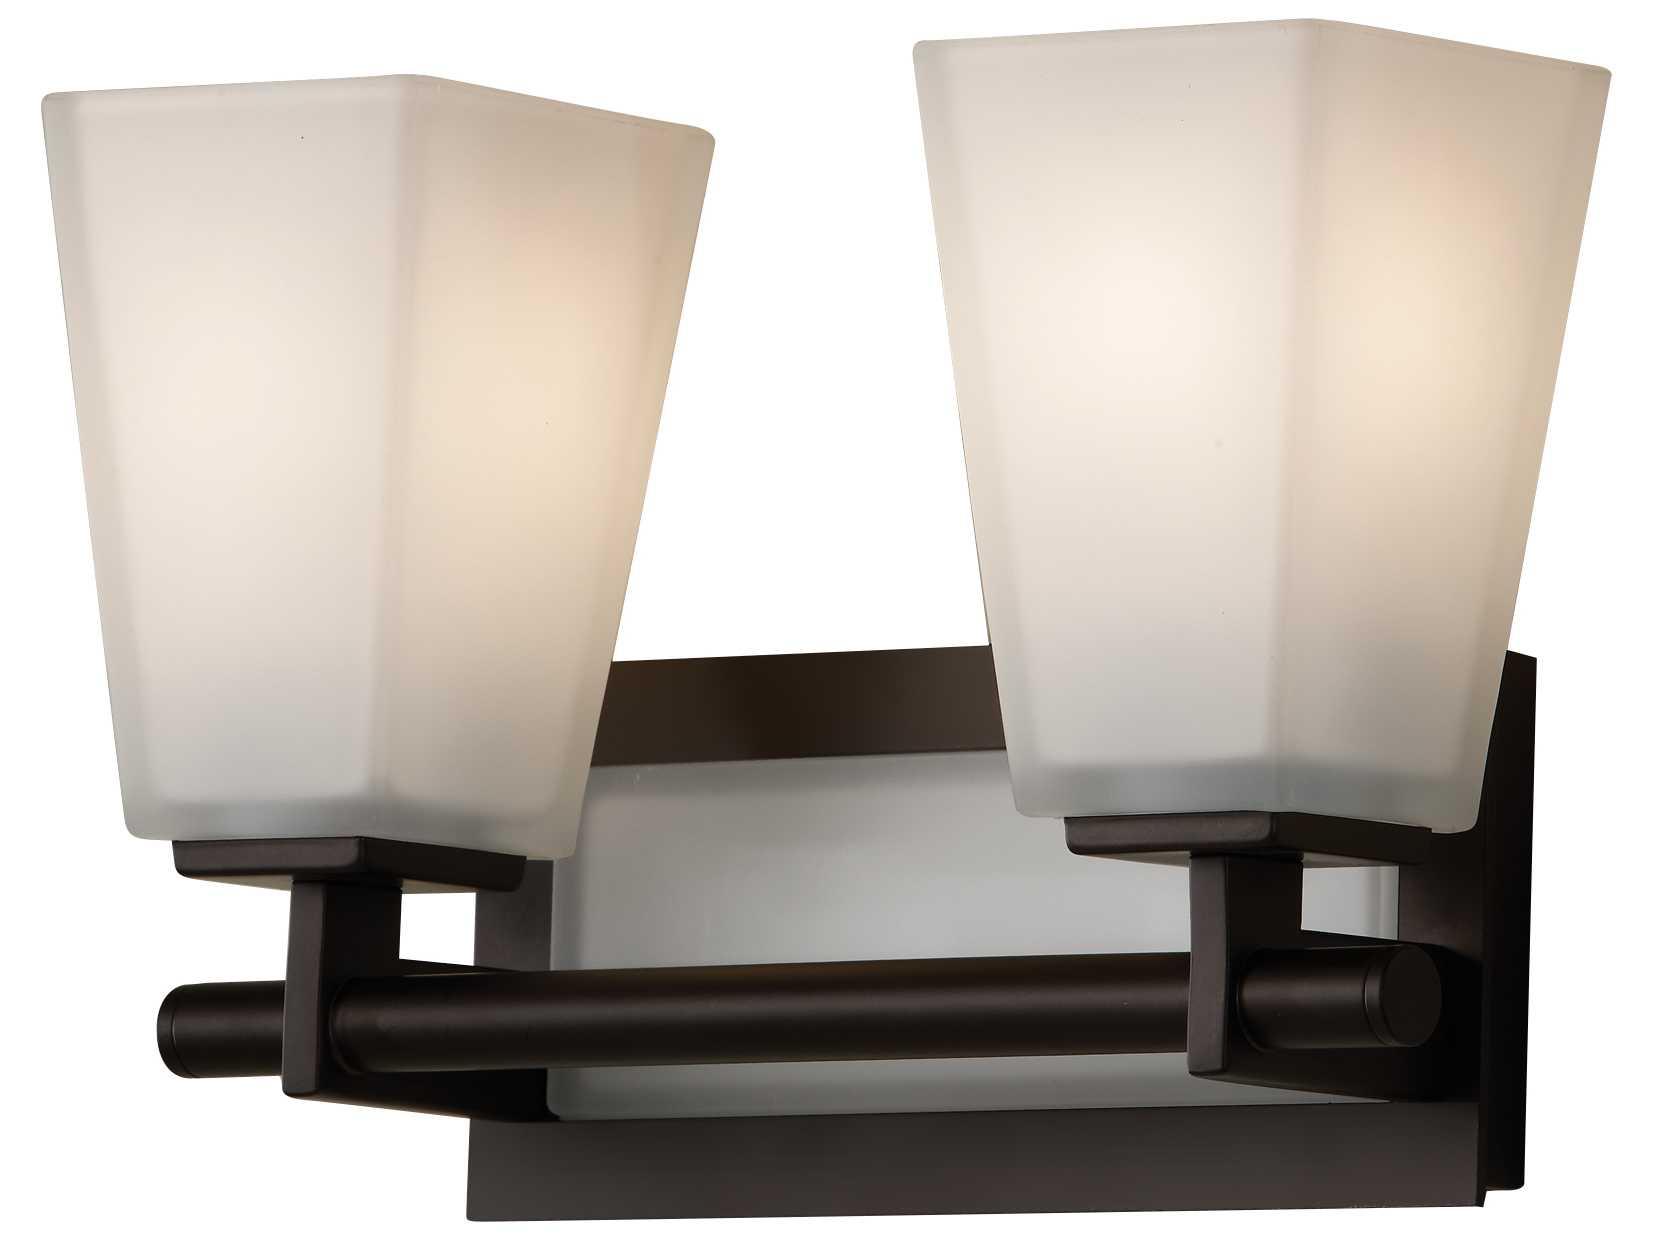 Feiss Bristol 2 Light Vanity Fixture In Oil Rubbed Bronze: Feiss Clayton Oil Rubbed Bronze Two-Light 13'' Wide Vanity